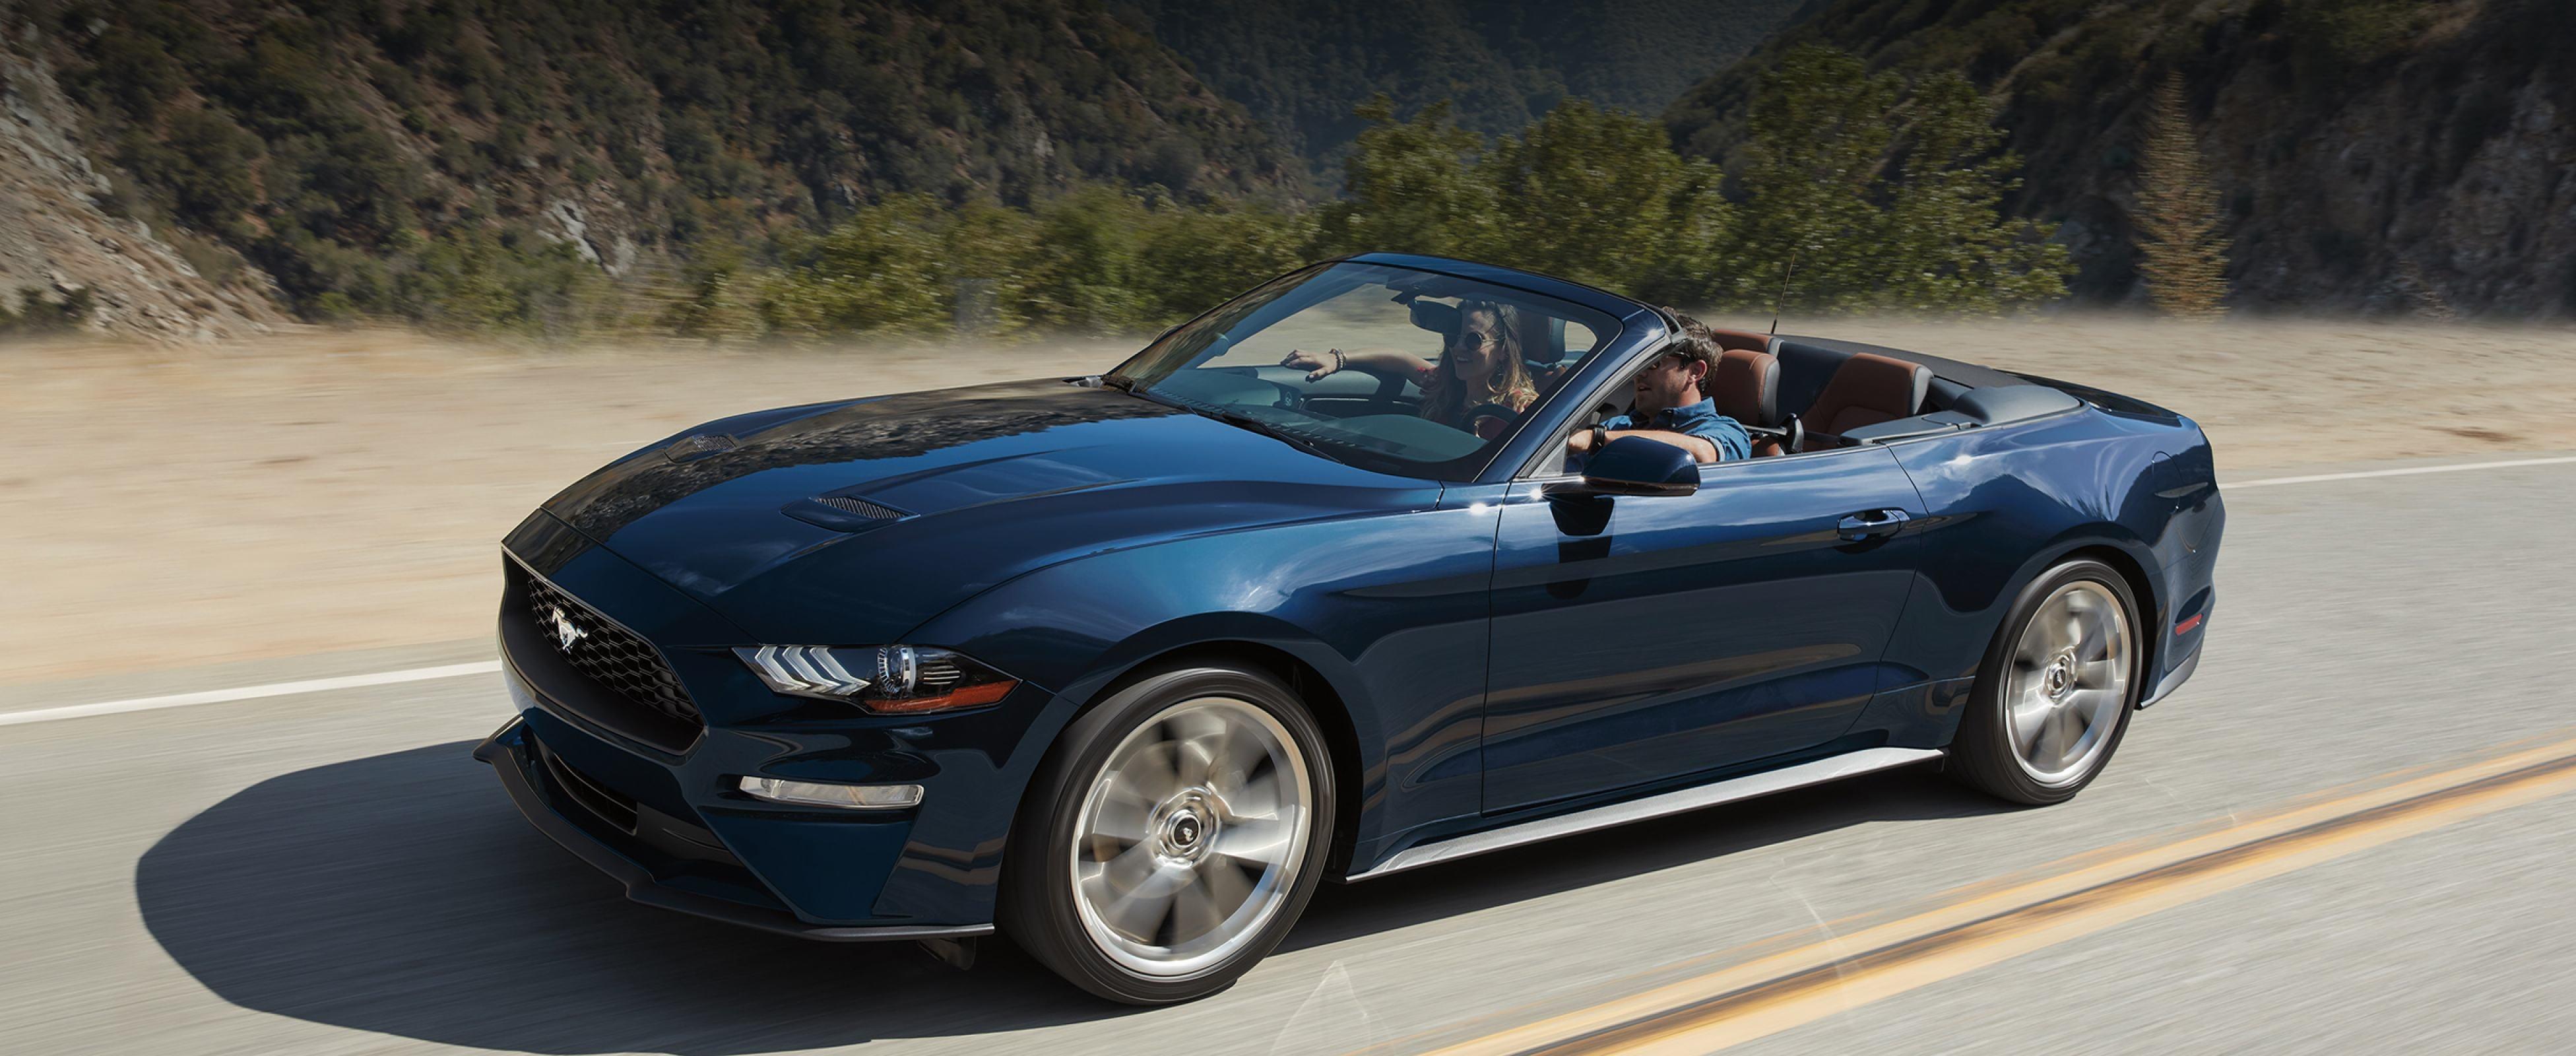 Convertible Rental Ford Mustang Convertible Or Similar Budget Rent A Car